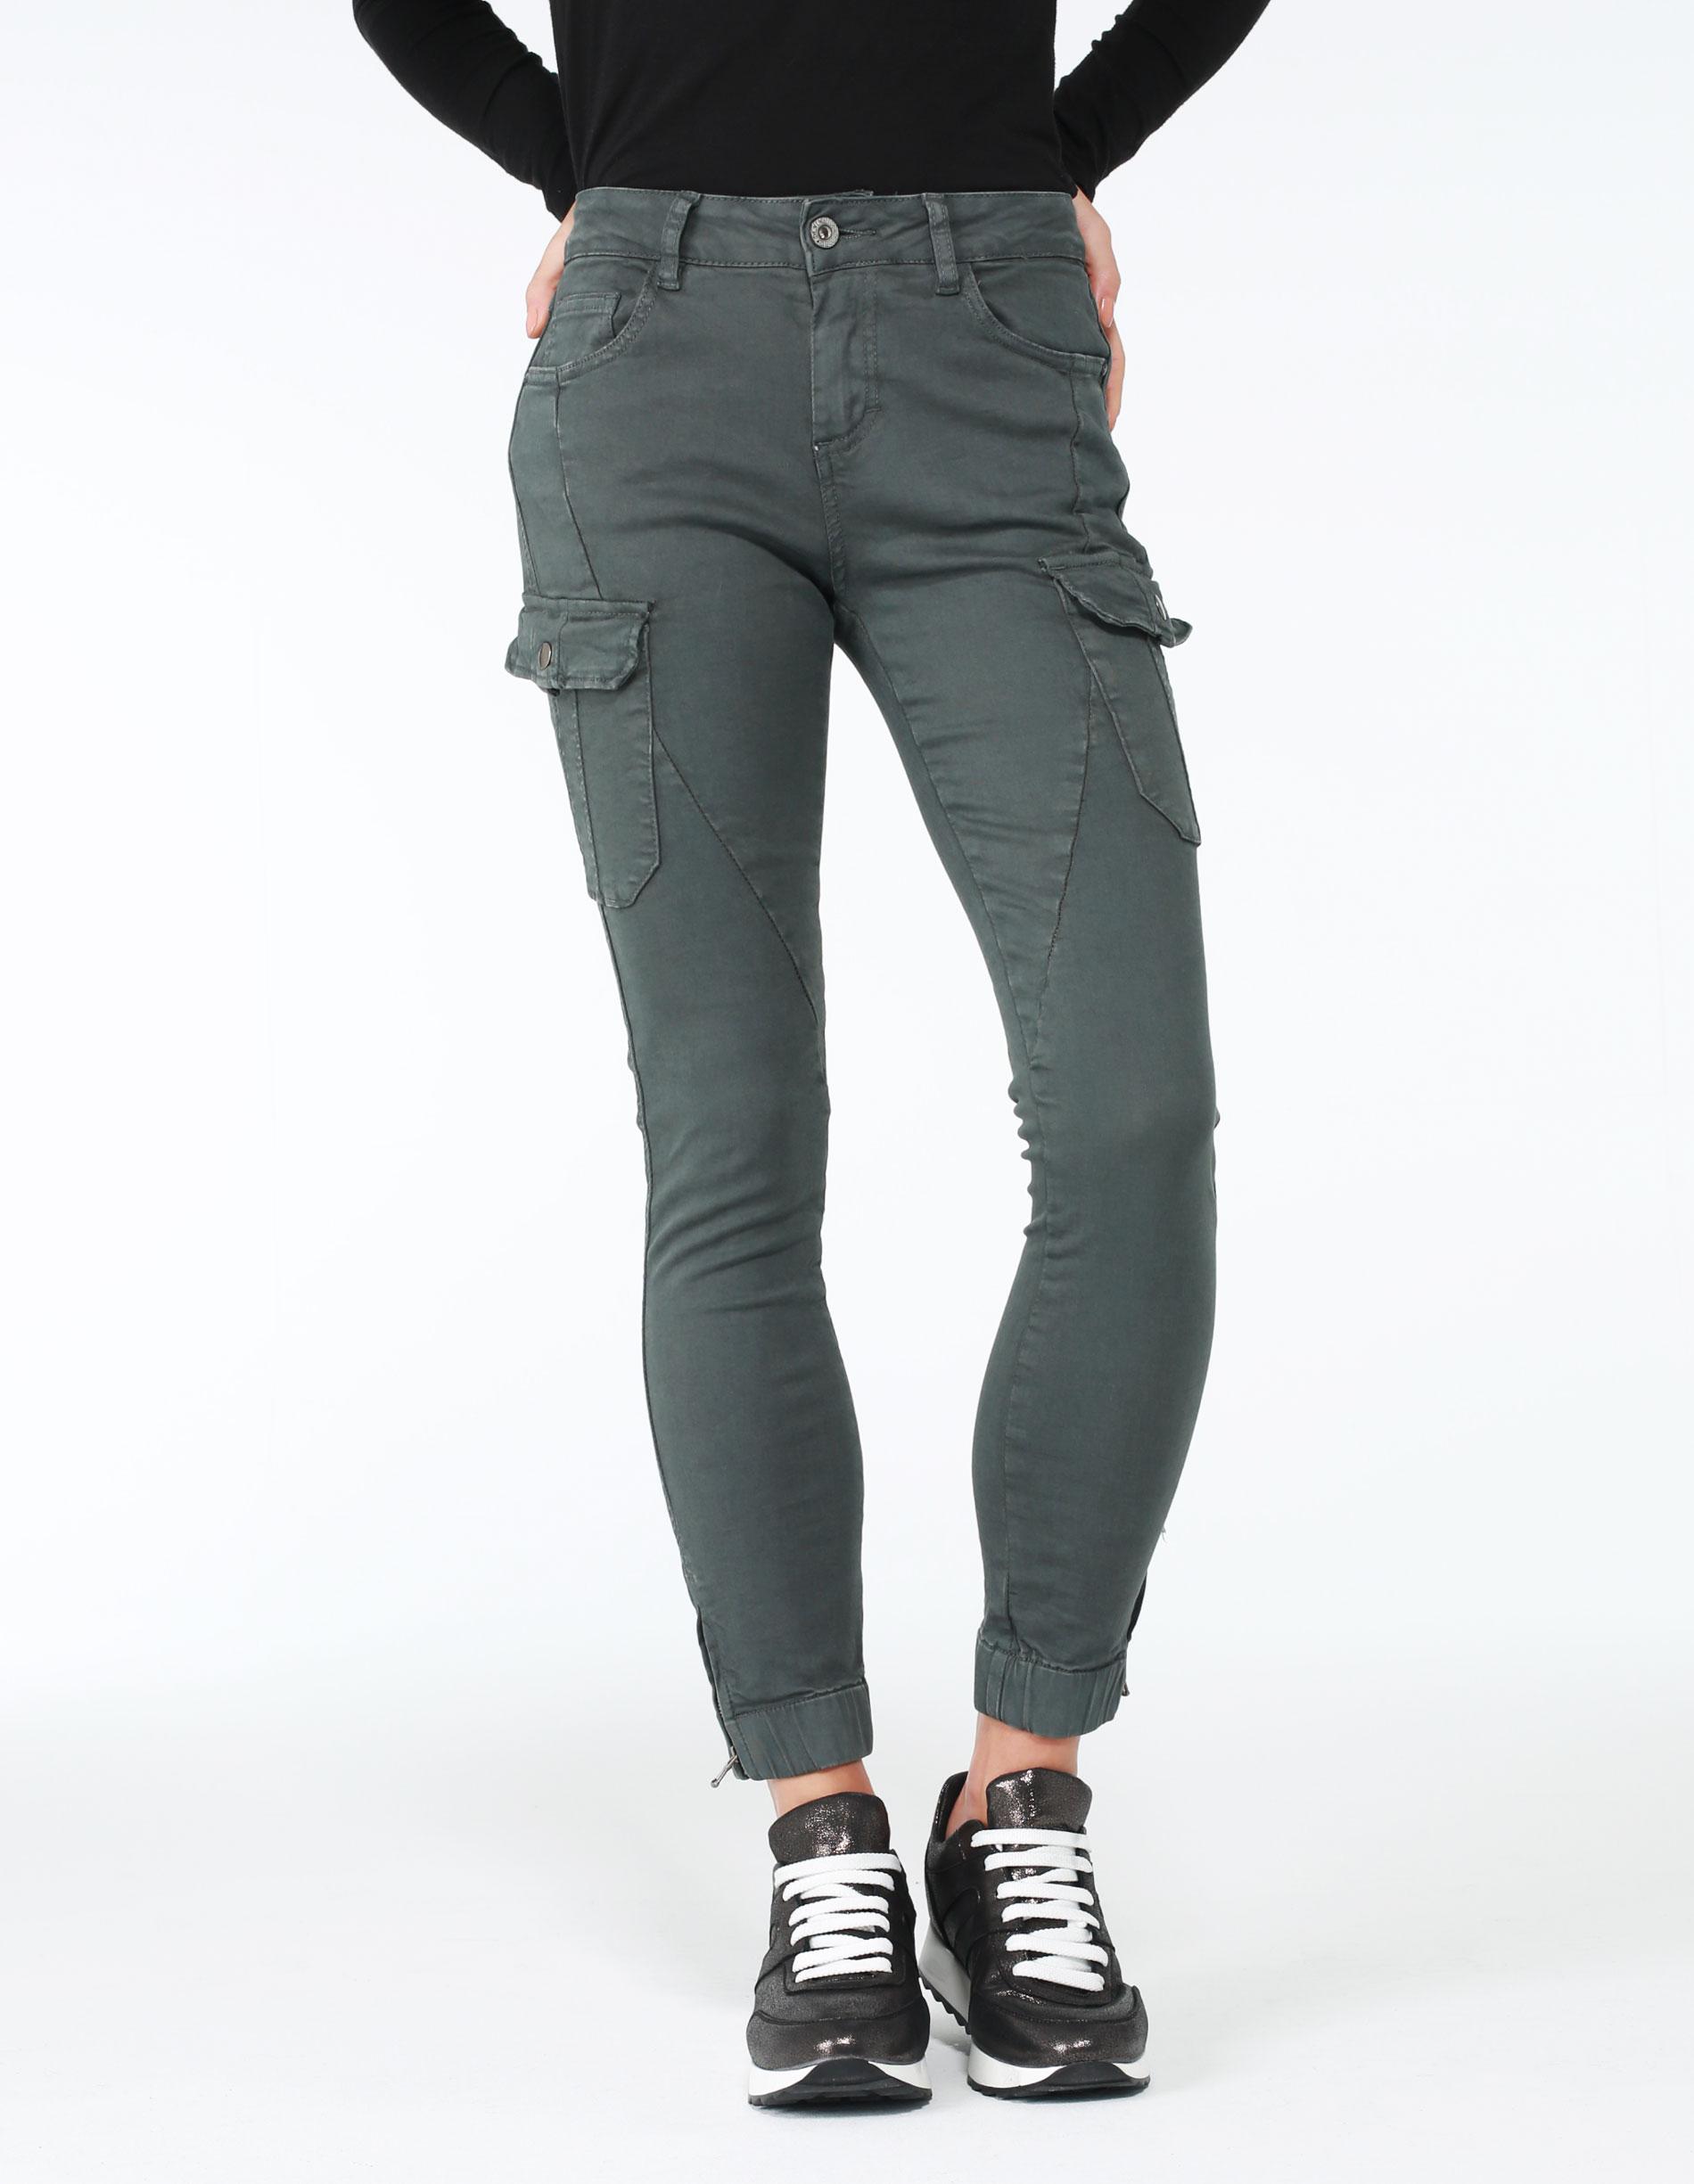 Spodnie - 70-4018 GRIGI - Unisono